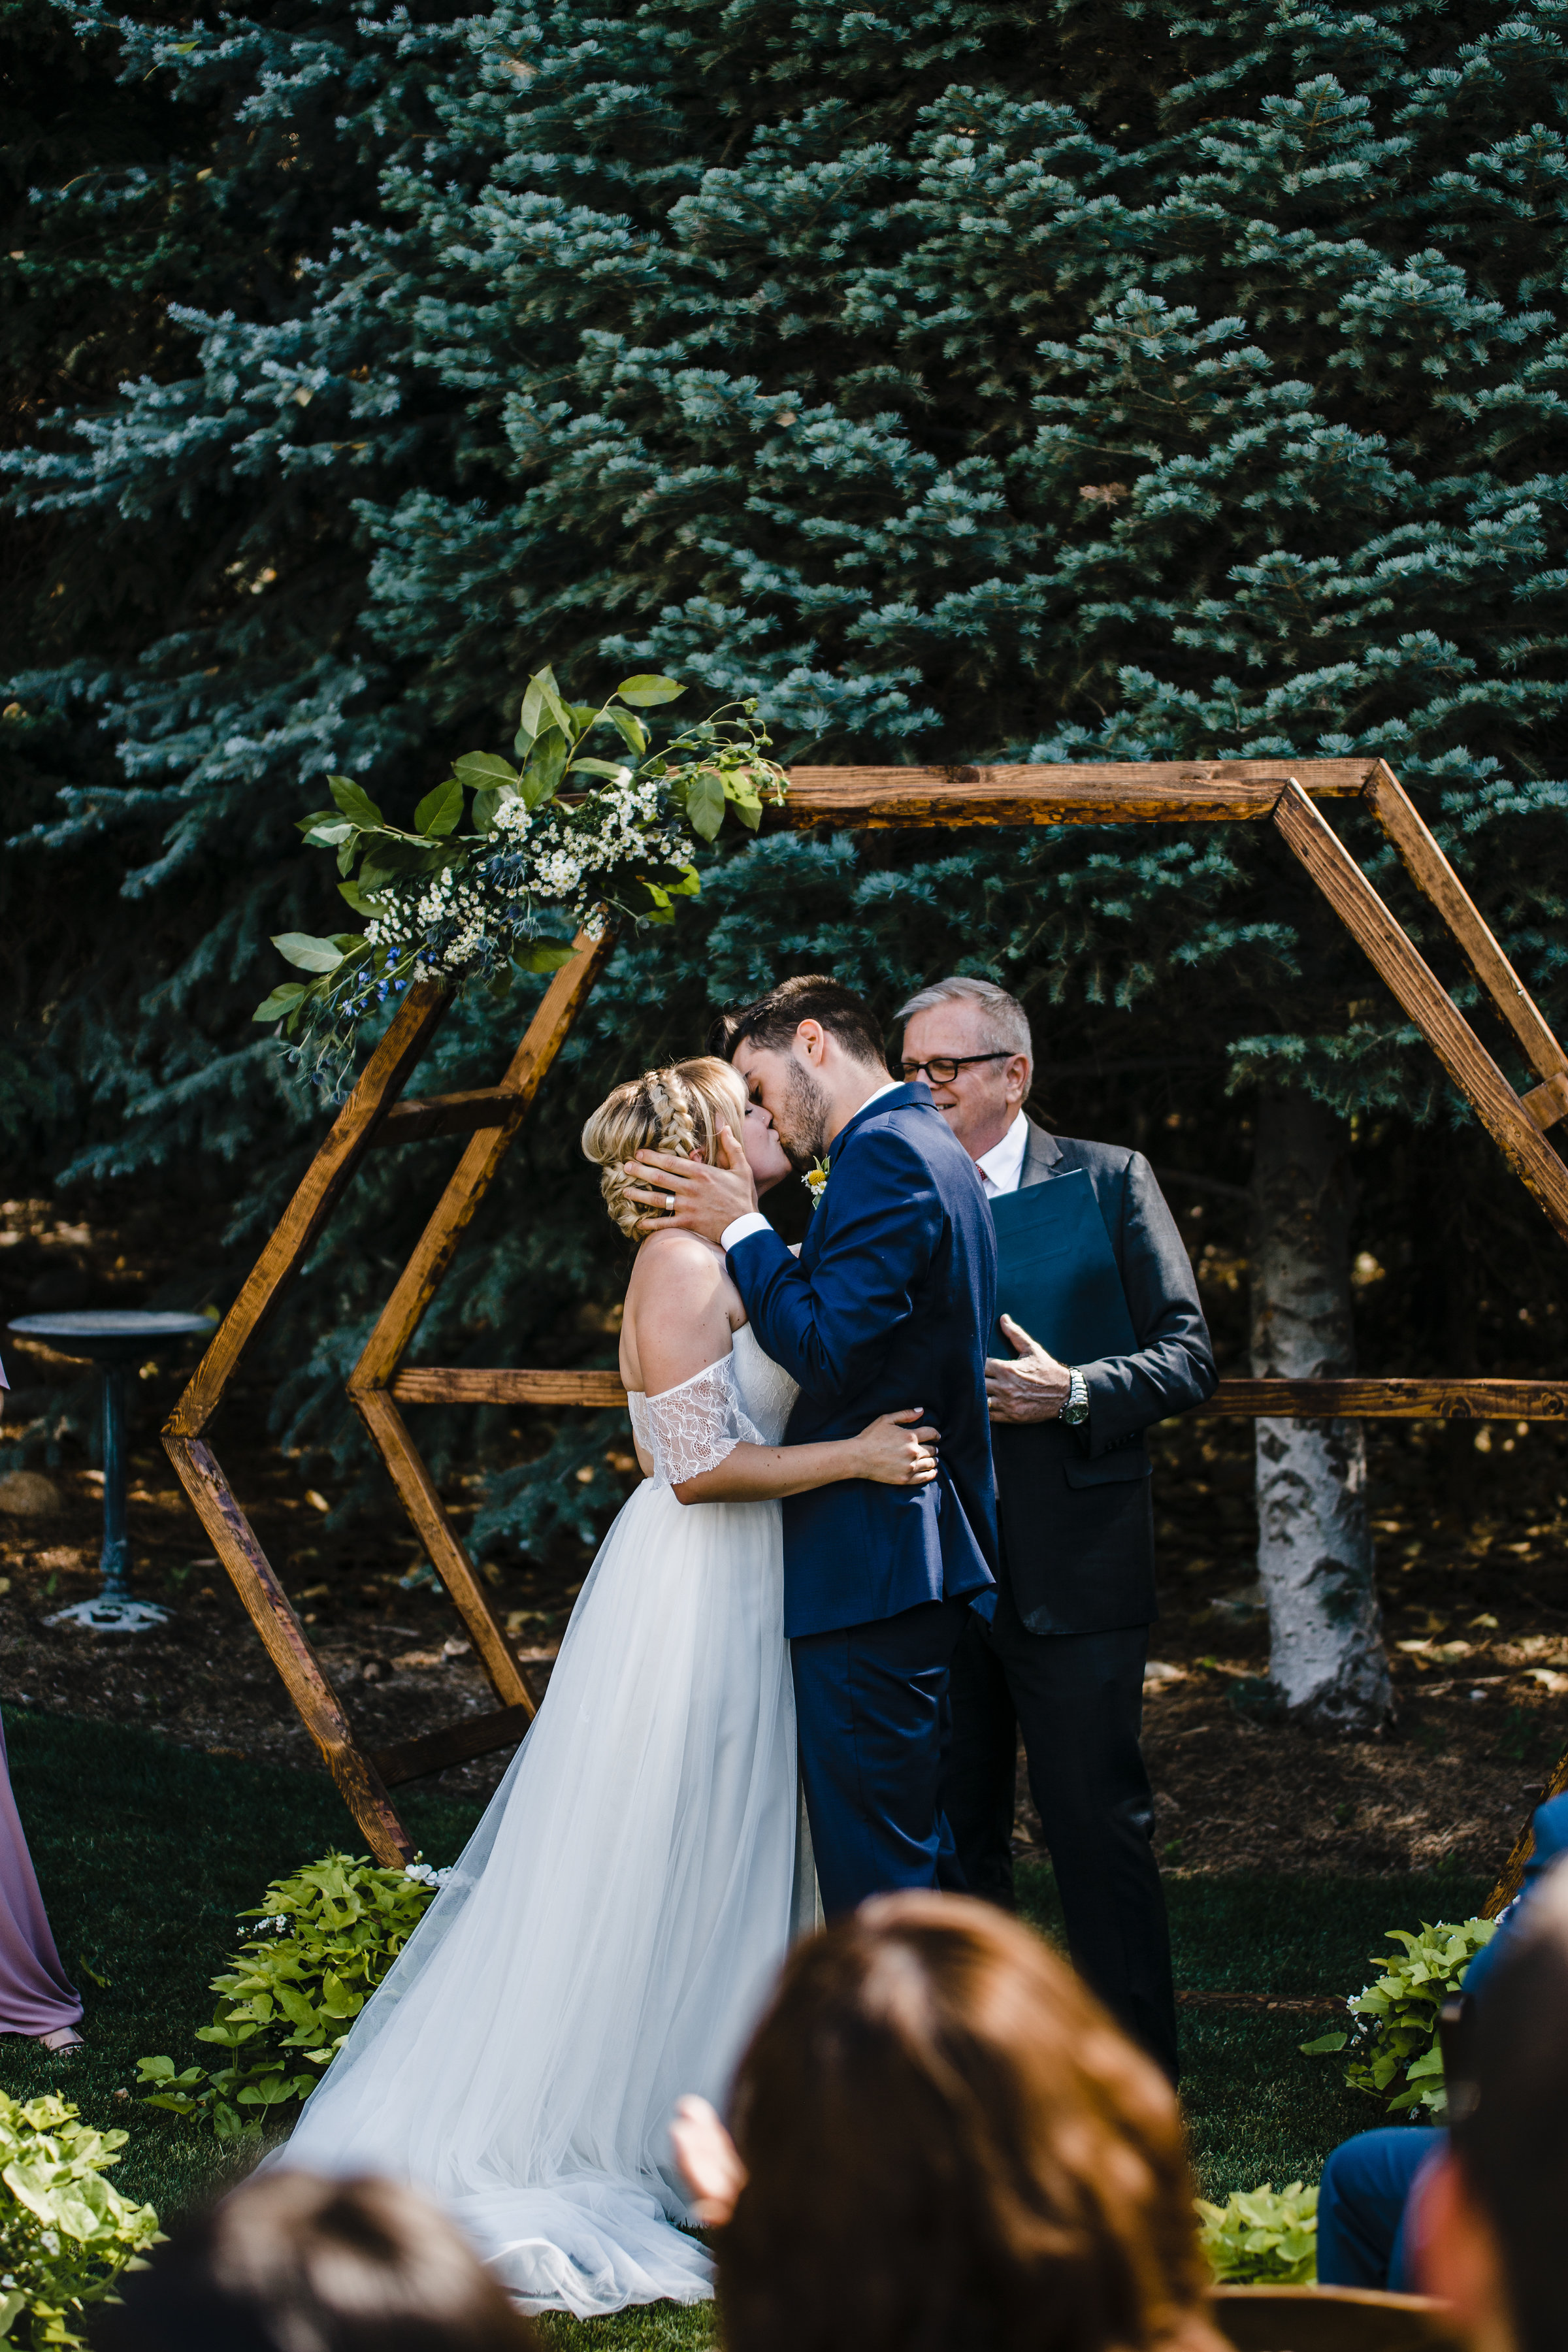 Salt Lake City utah wedding photographer wedding exit outdoor ceremony bohemian wedding arch florals geometric kissing